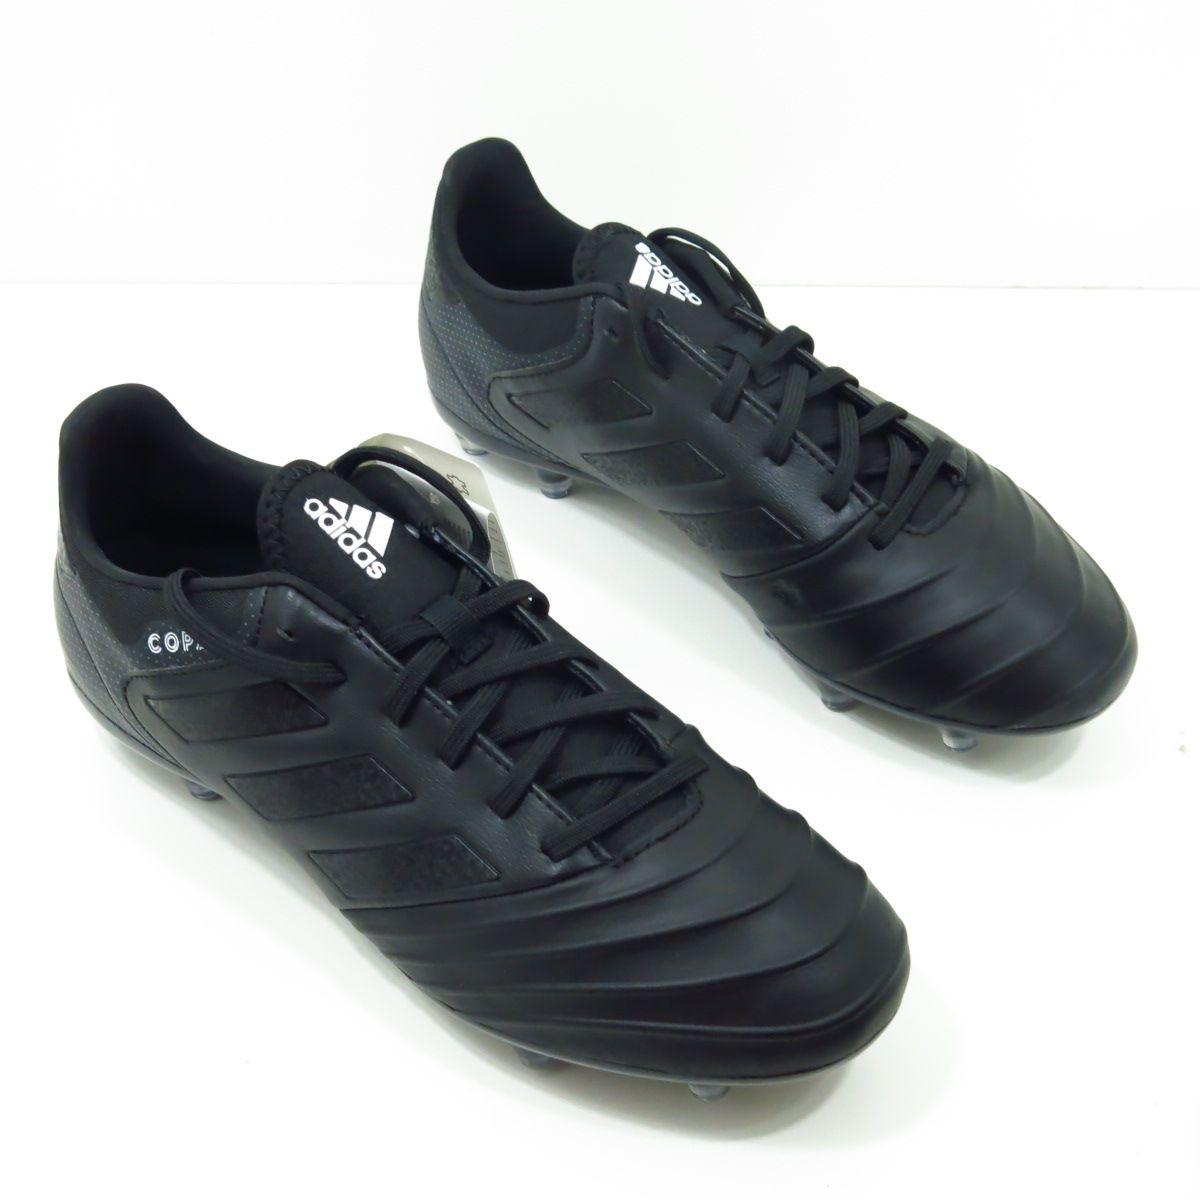 Chuteira Adidas Copa 18.2 FG - Blackout Couro